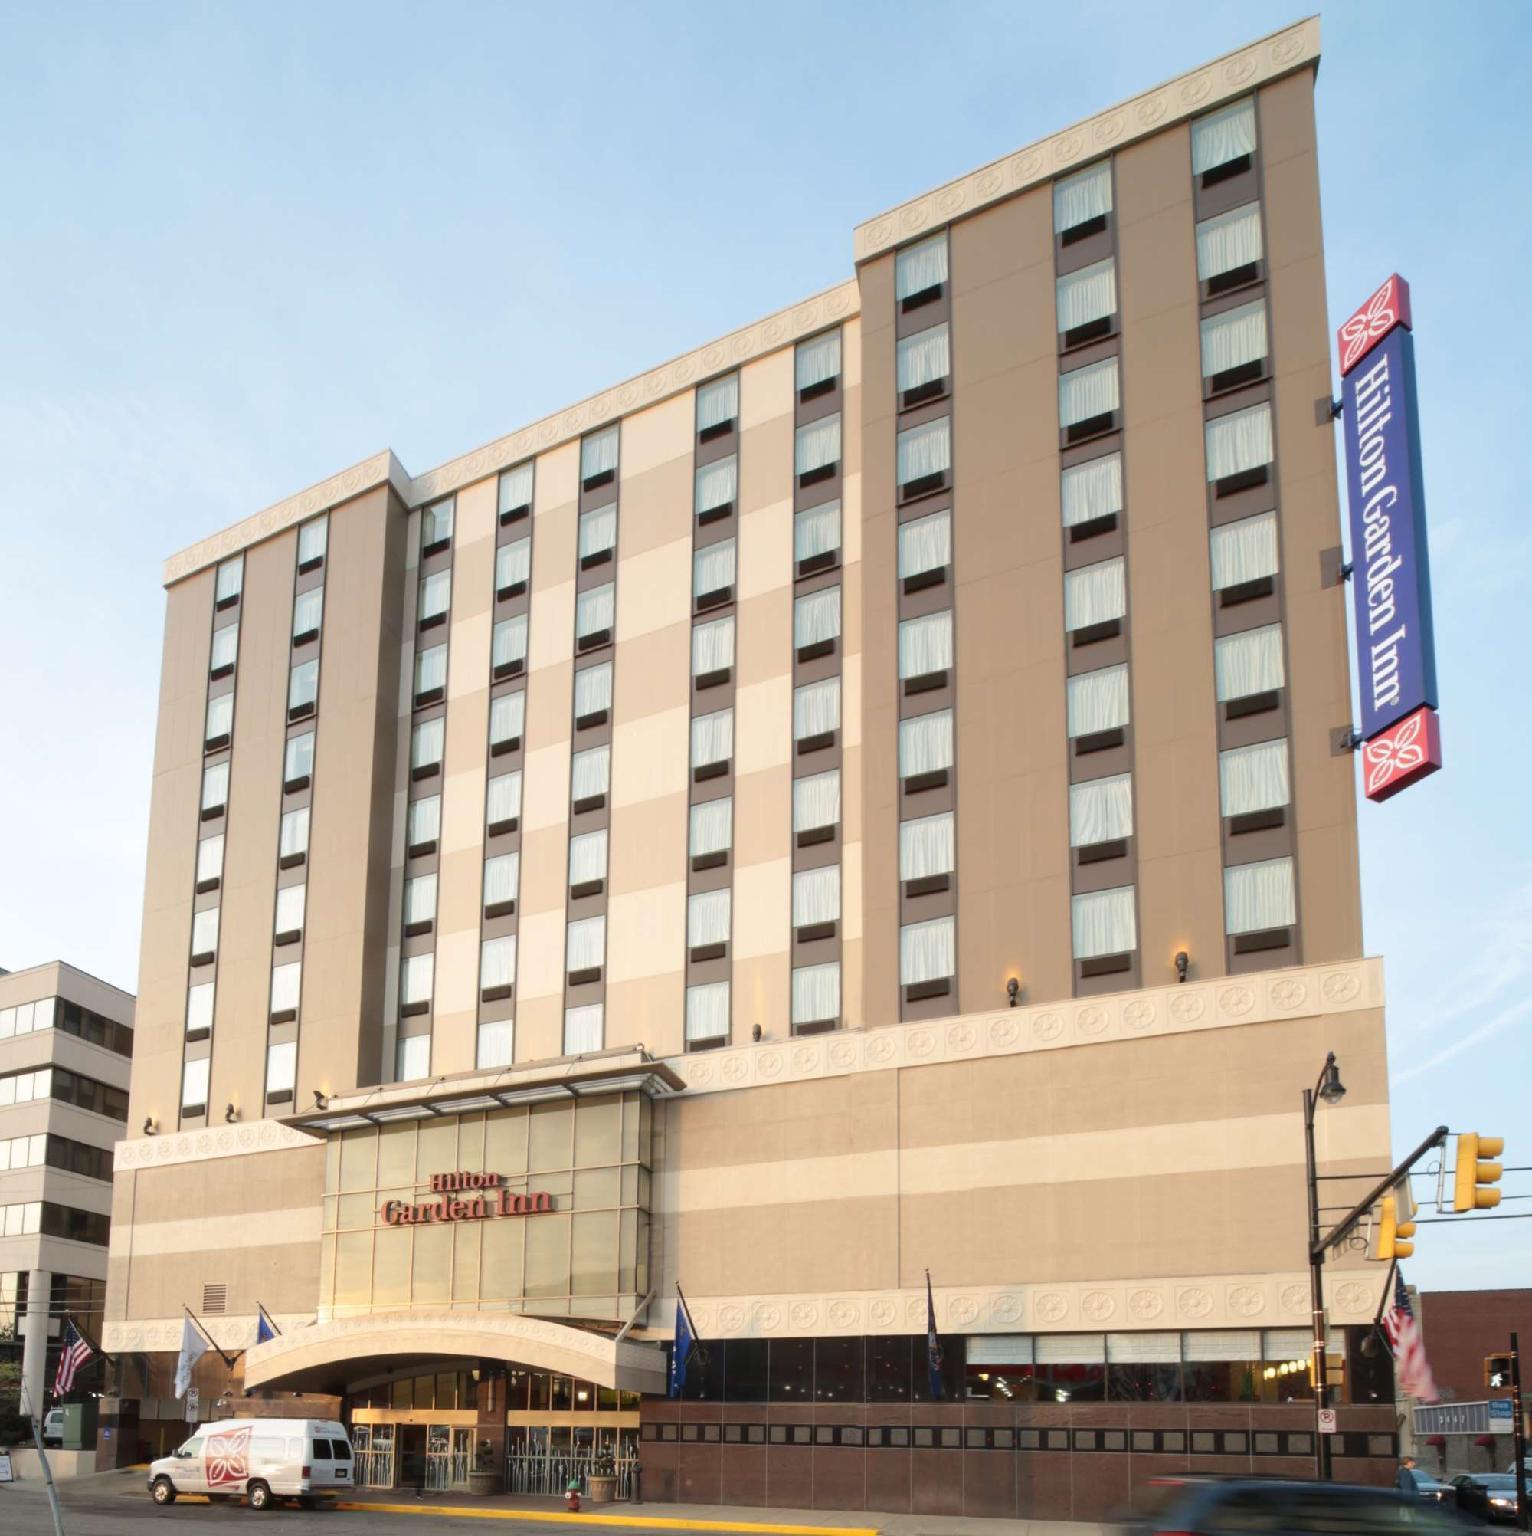 Hilton Garden Inn Pittsburgh University Place image